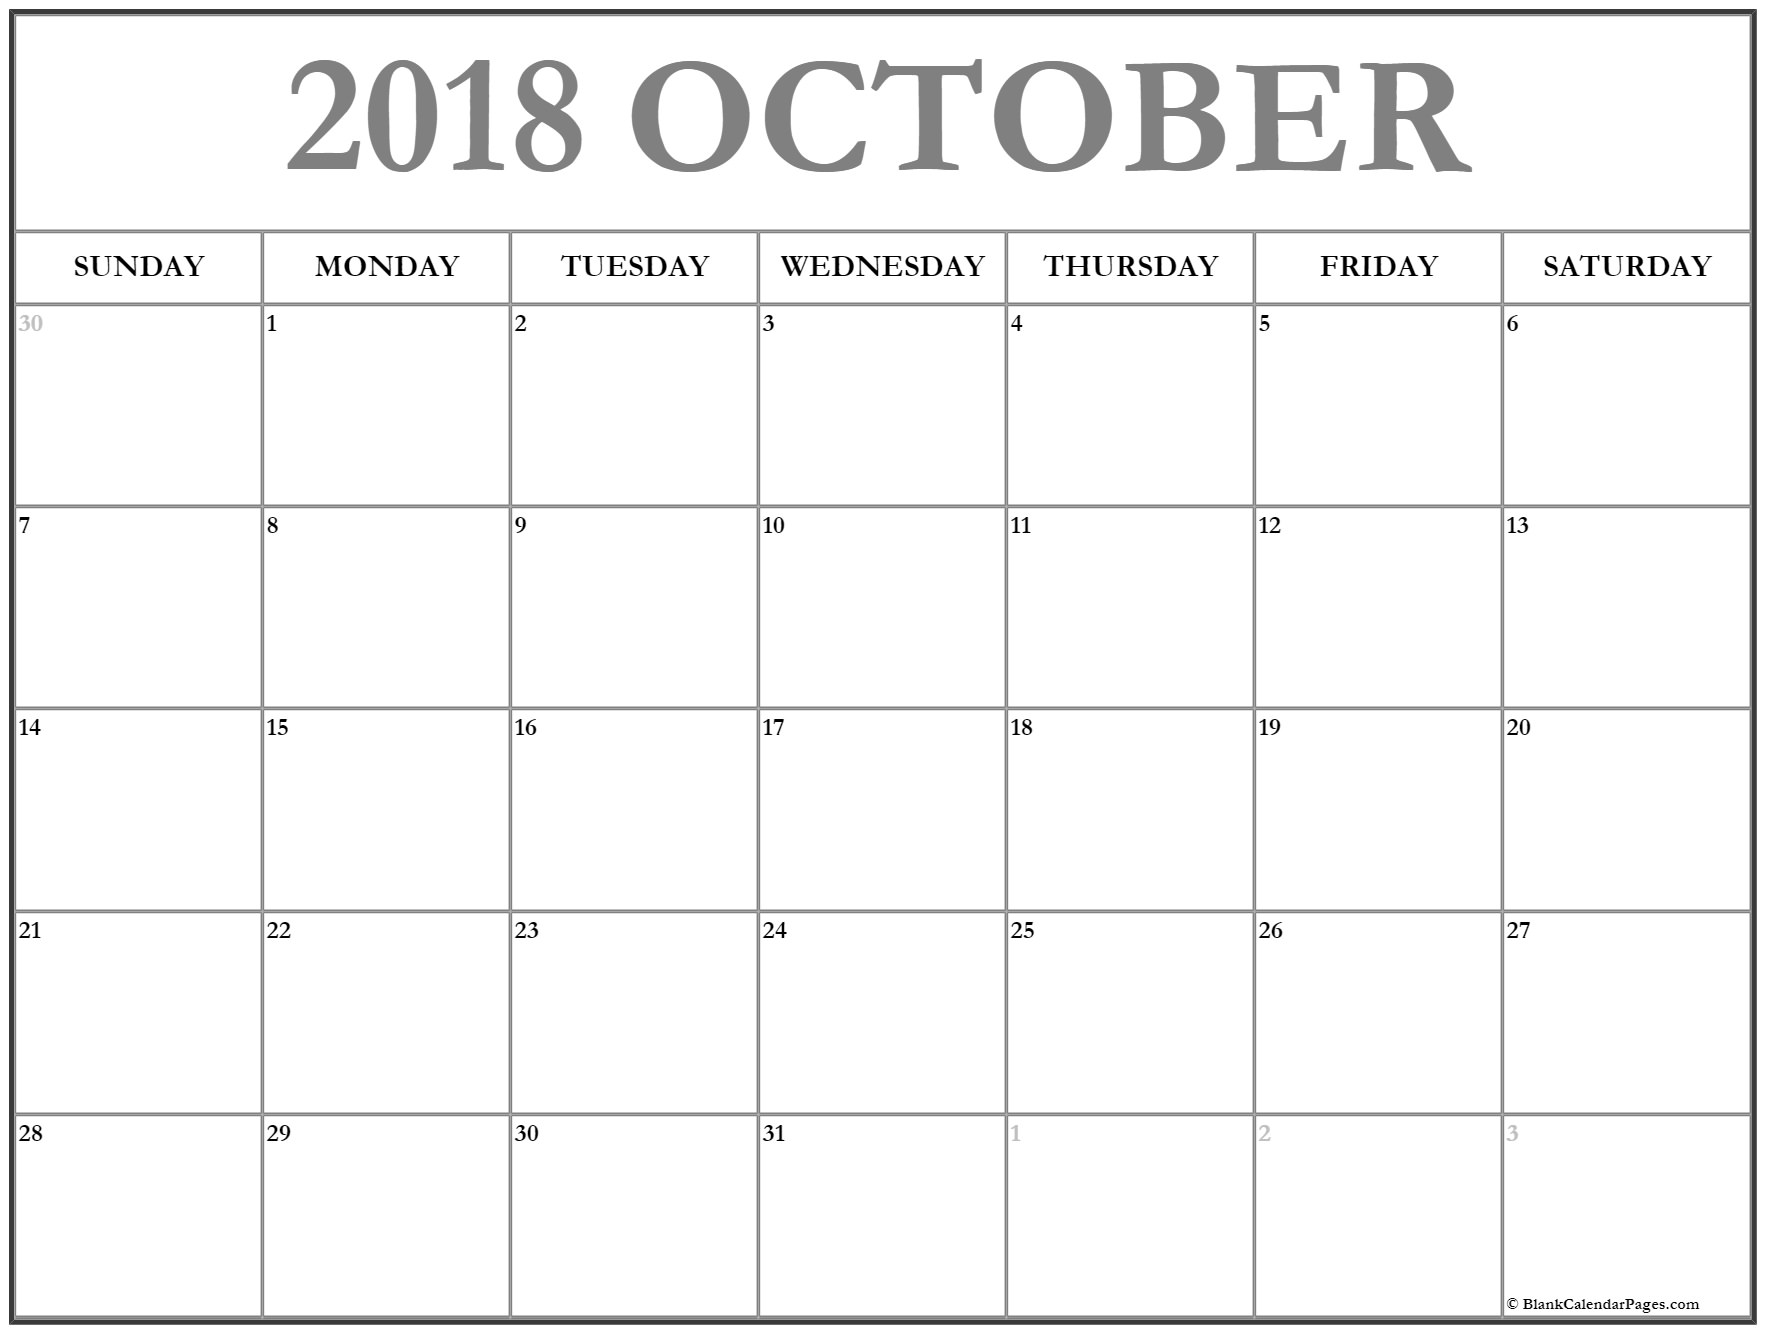 October 2018 South Africa Calendar